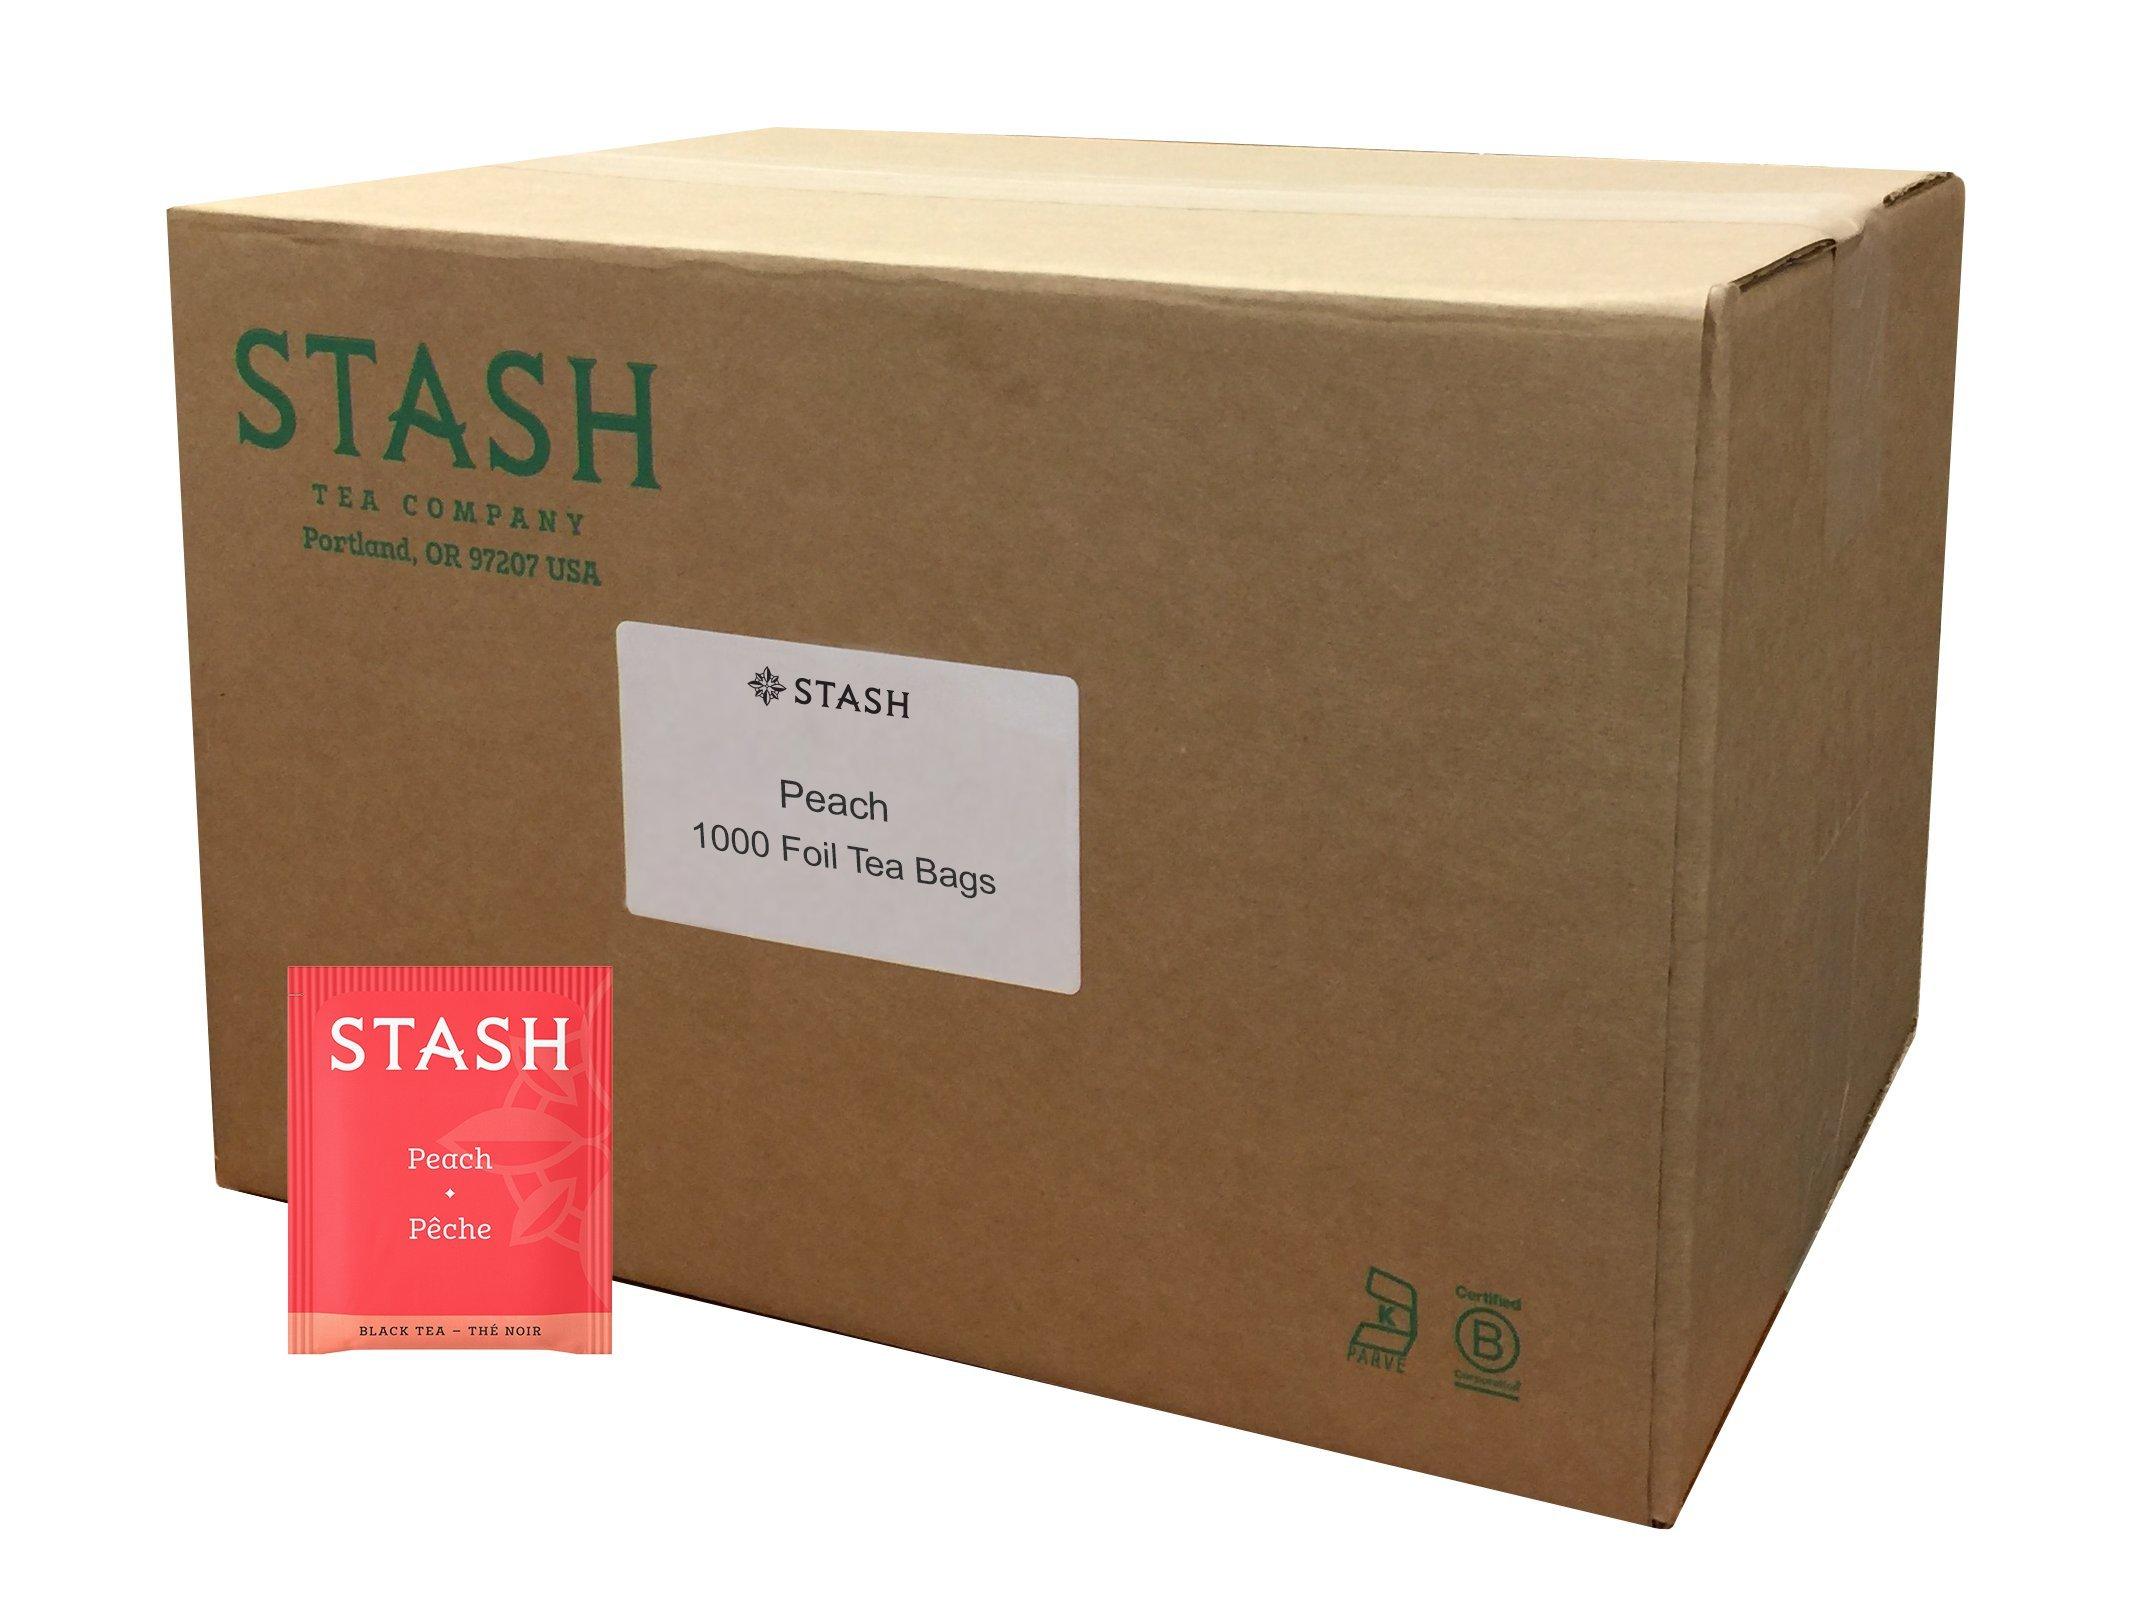 Stash Tea Peach Black Tea 1000 Tea Bags in Foil Individual Black Tea Bags for Use in Teapots Mugs or Cups, Brew Hot Tea or Iced Tea